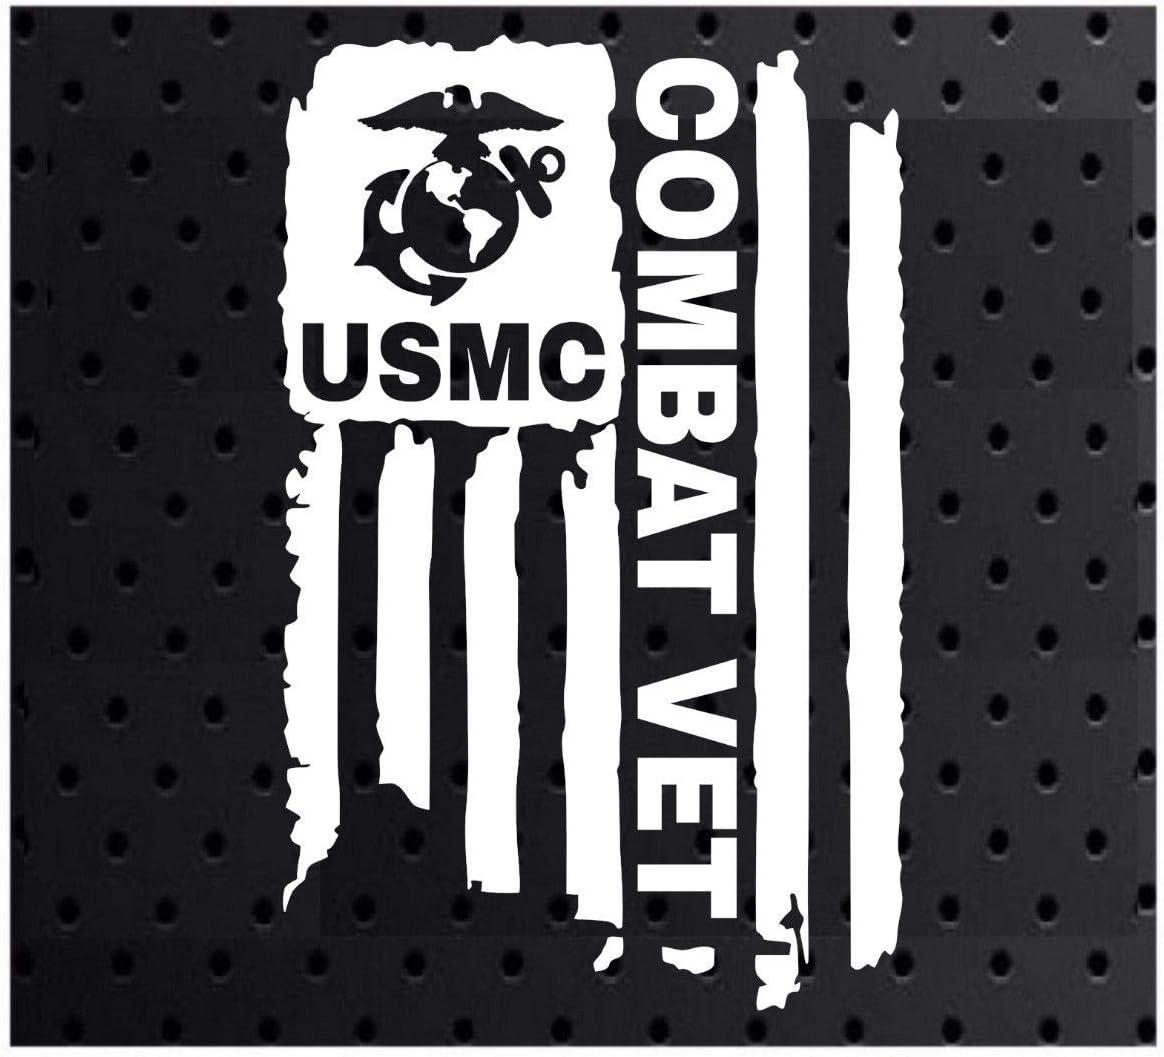 USMC  MOTORCYCLE HELMET REFLECTIVE DECAL.2 FOR 1 PRICE